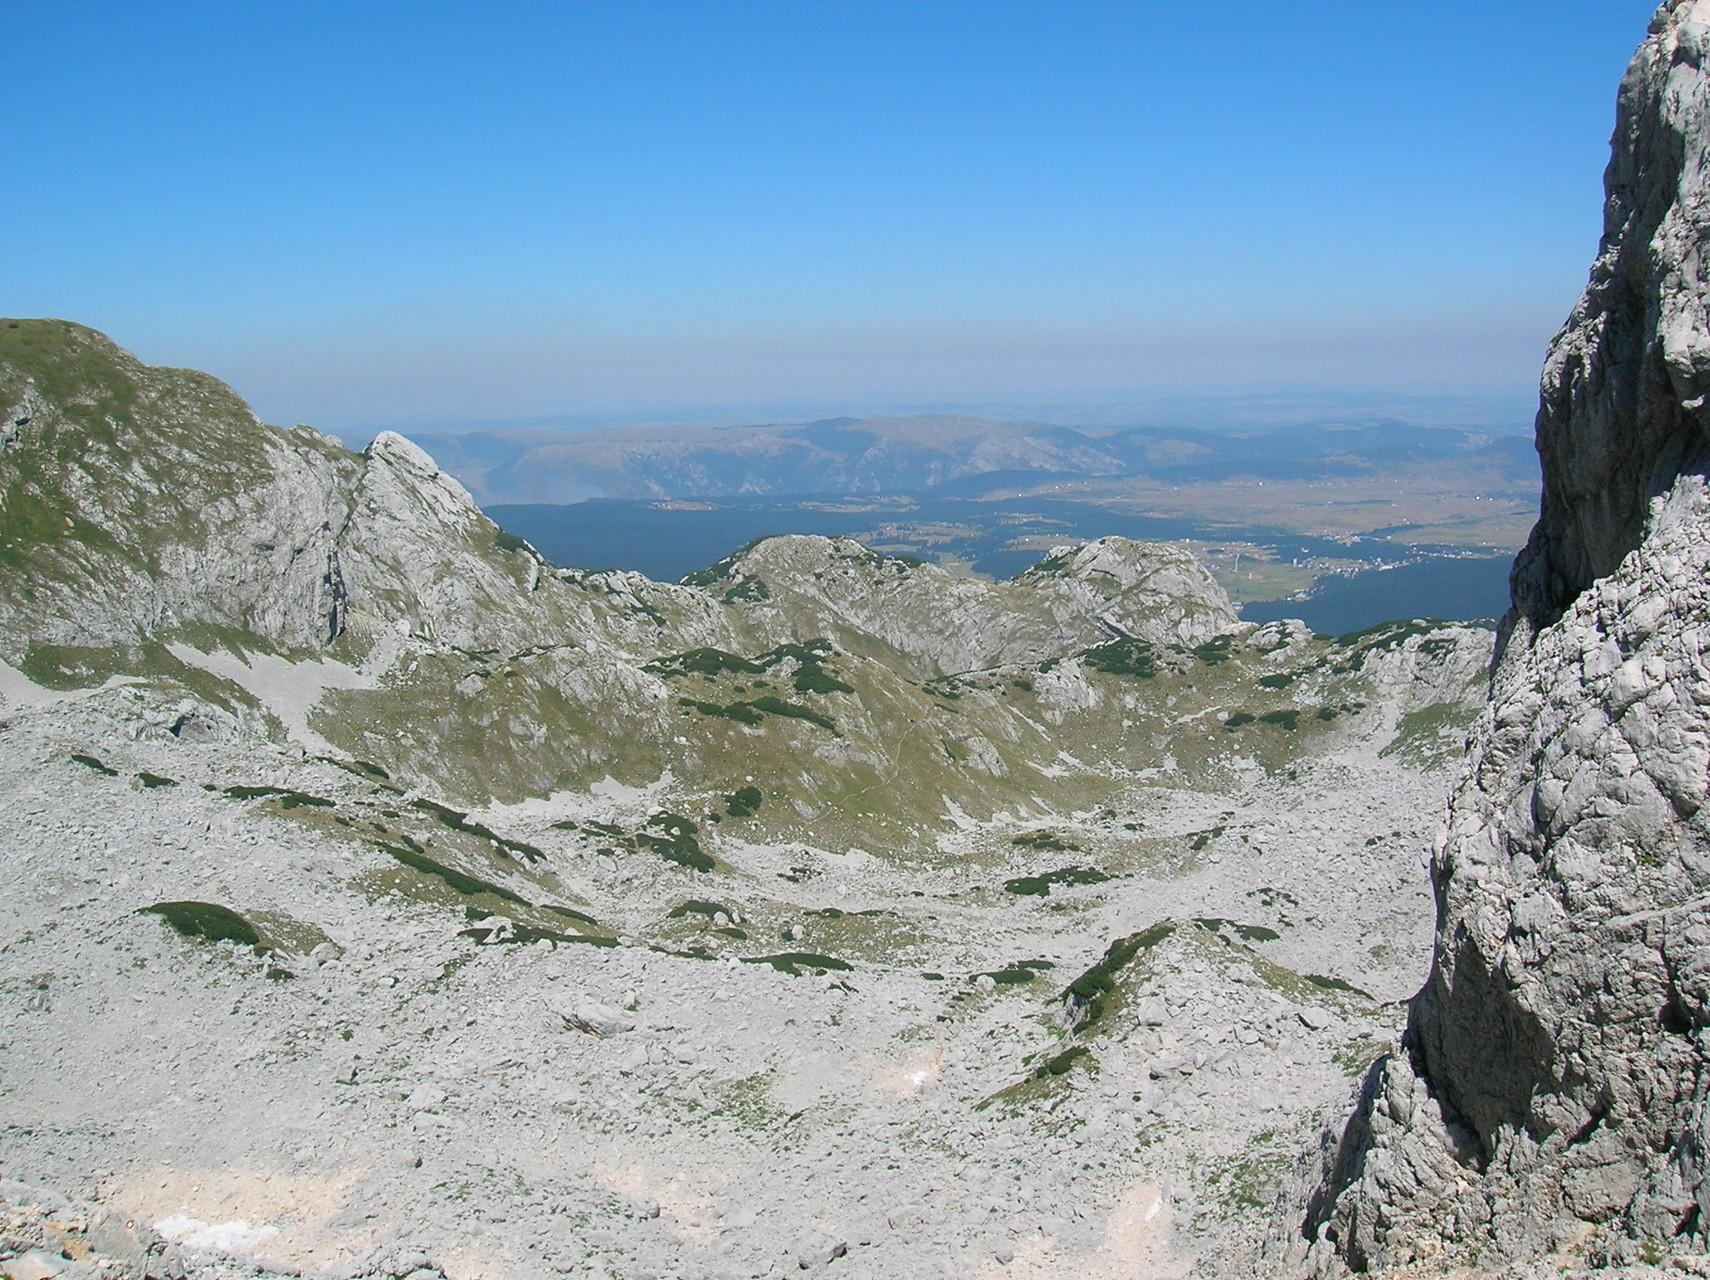 Blick vom Bobotov Kuk, Durmitor-Gebirge